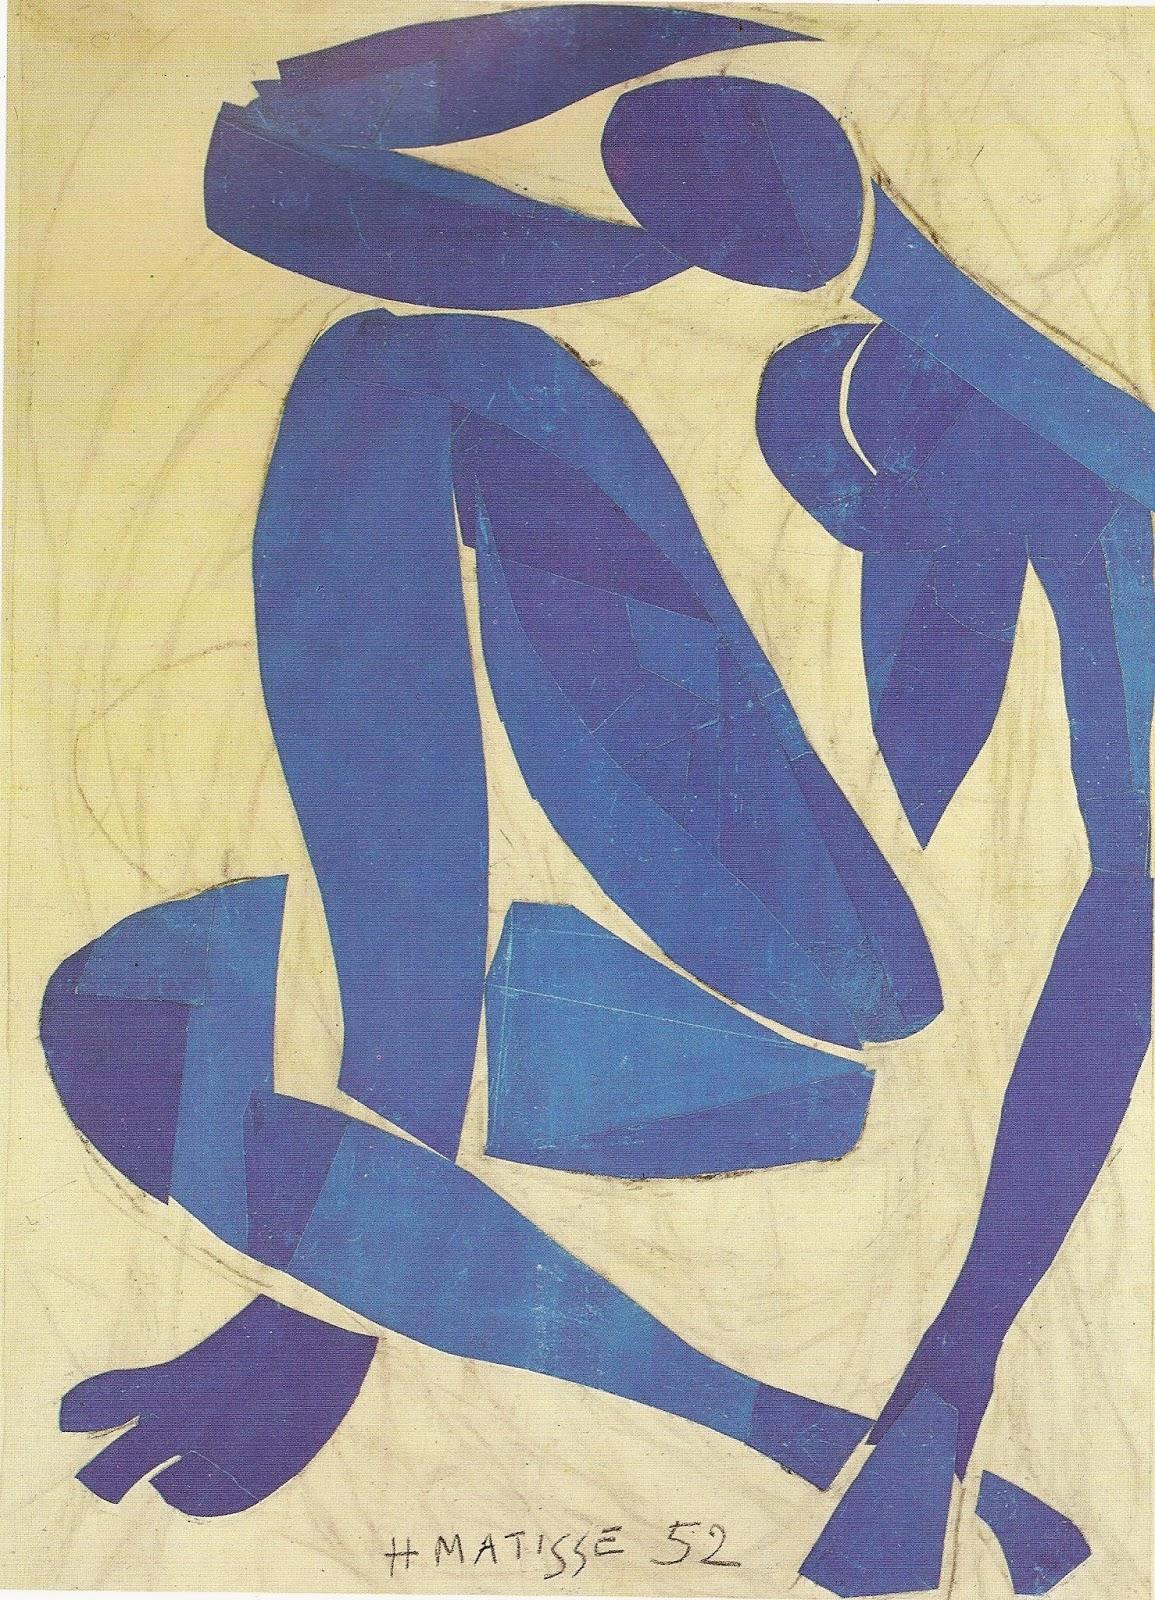 BLAUER AKT - Nach Henri Matisse - dedawandacom